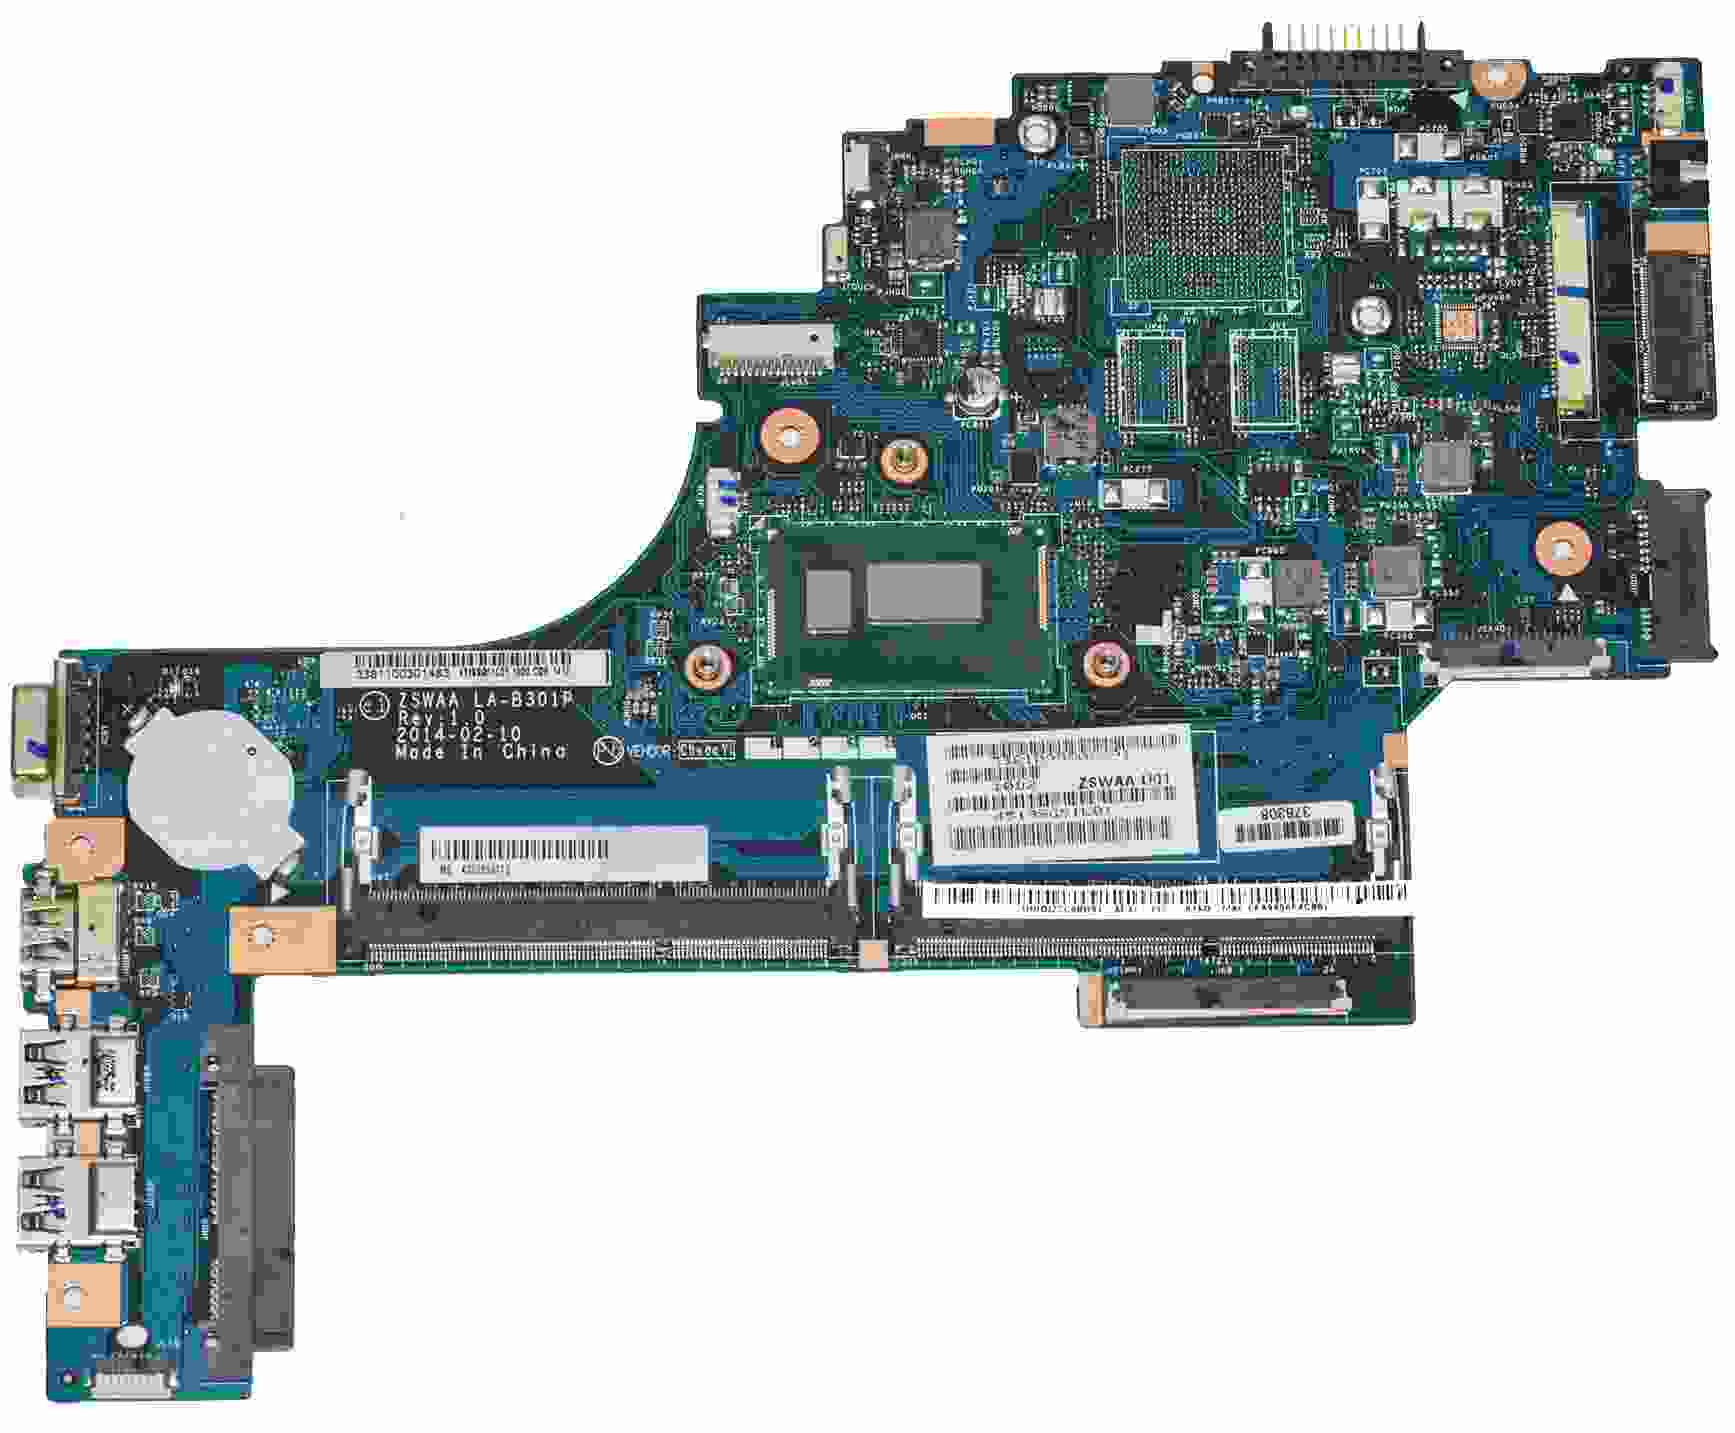 K000889110 Toshiba Satellie C55T B5109 Laptop Motherbaord con Intel i3-4005U 1... + Toshiba en Veo y Compro